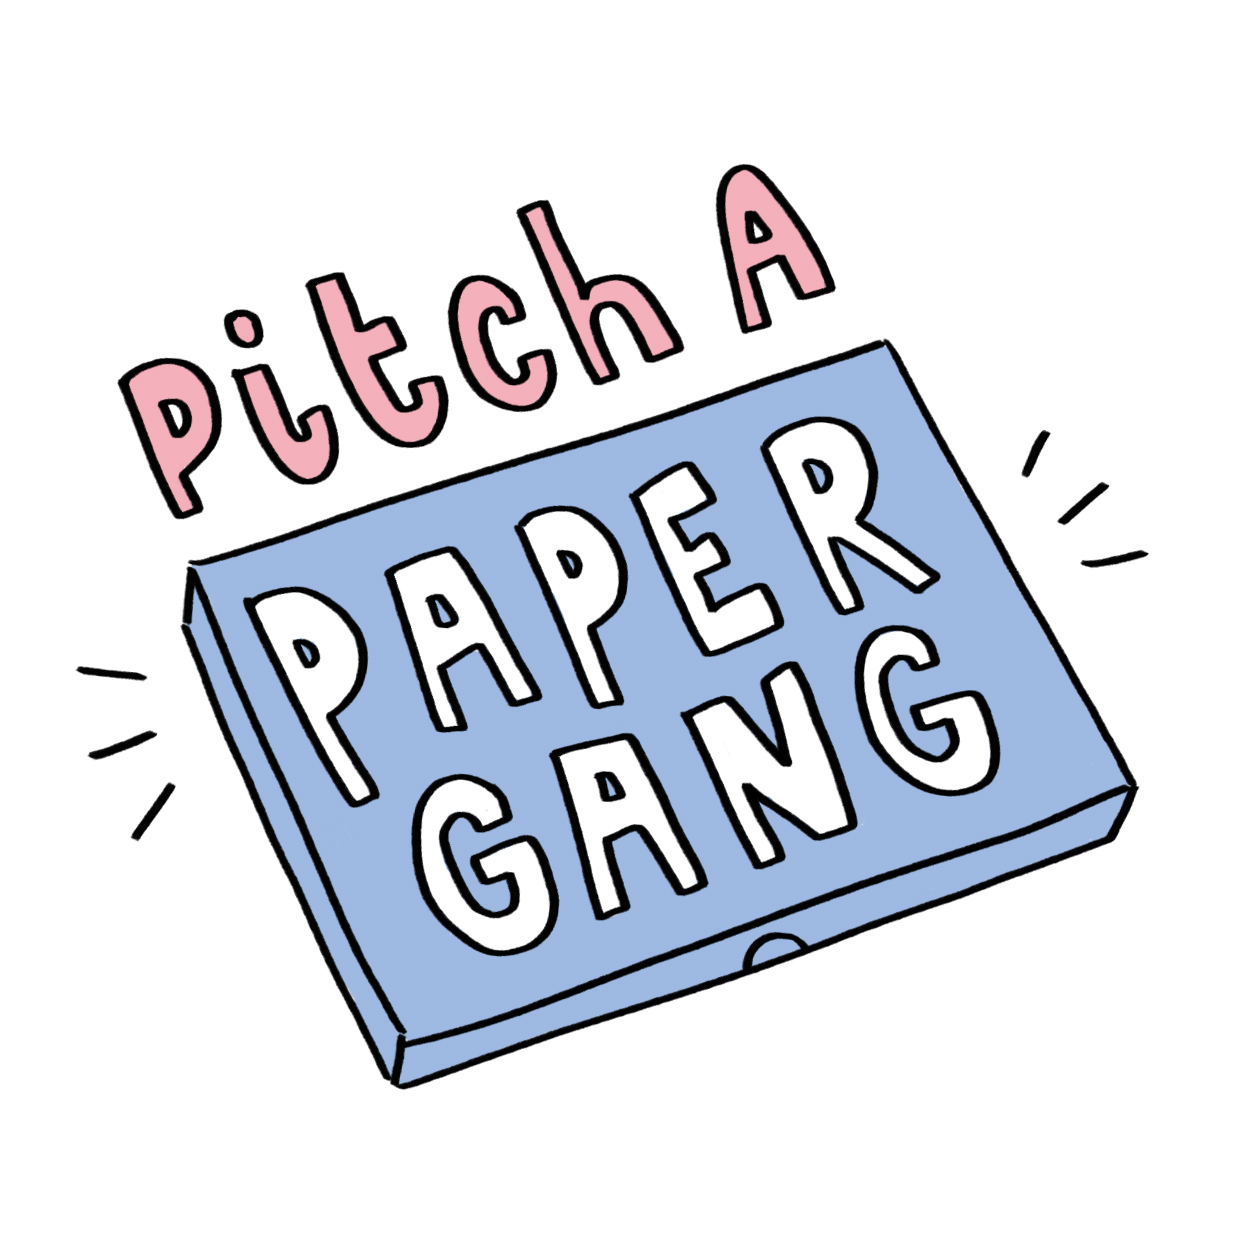 Pitch-A-Papergang-Logo.jpg